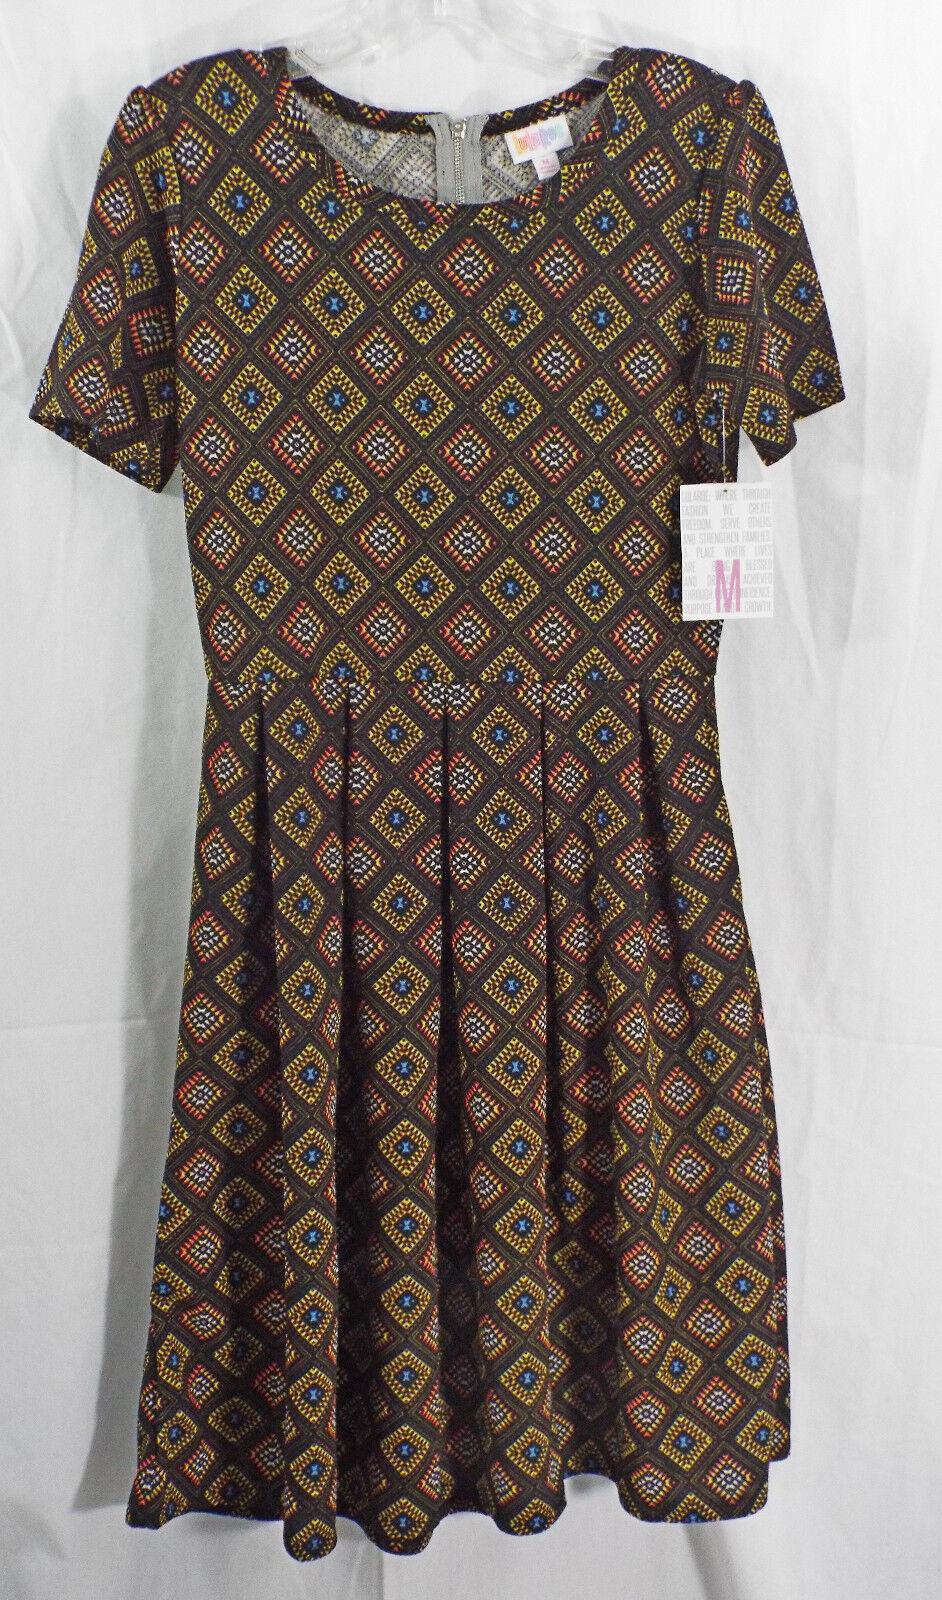 damen LuLaRoe Dress Medium Amelia schwarz Multi ColGoldt Geometric NWT